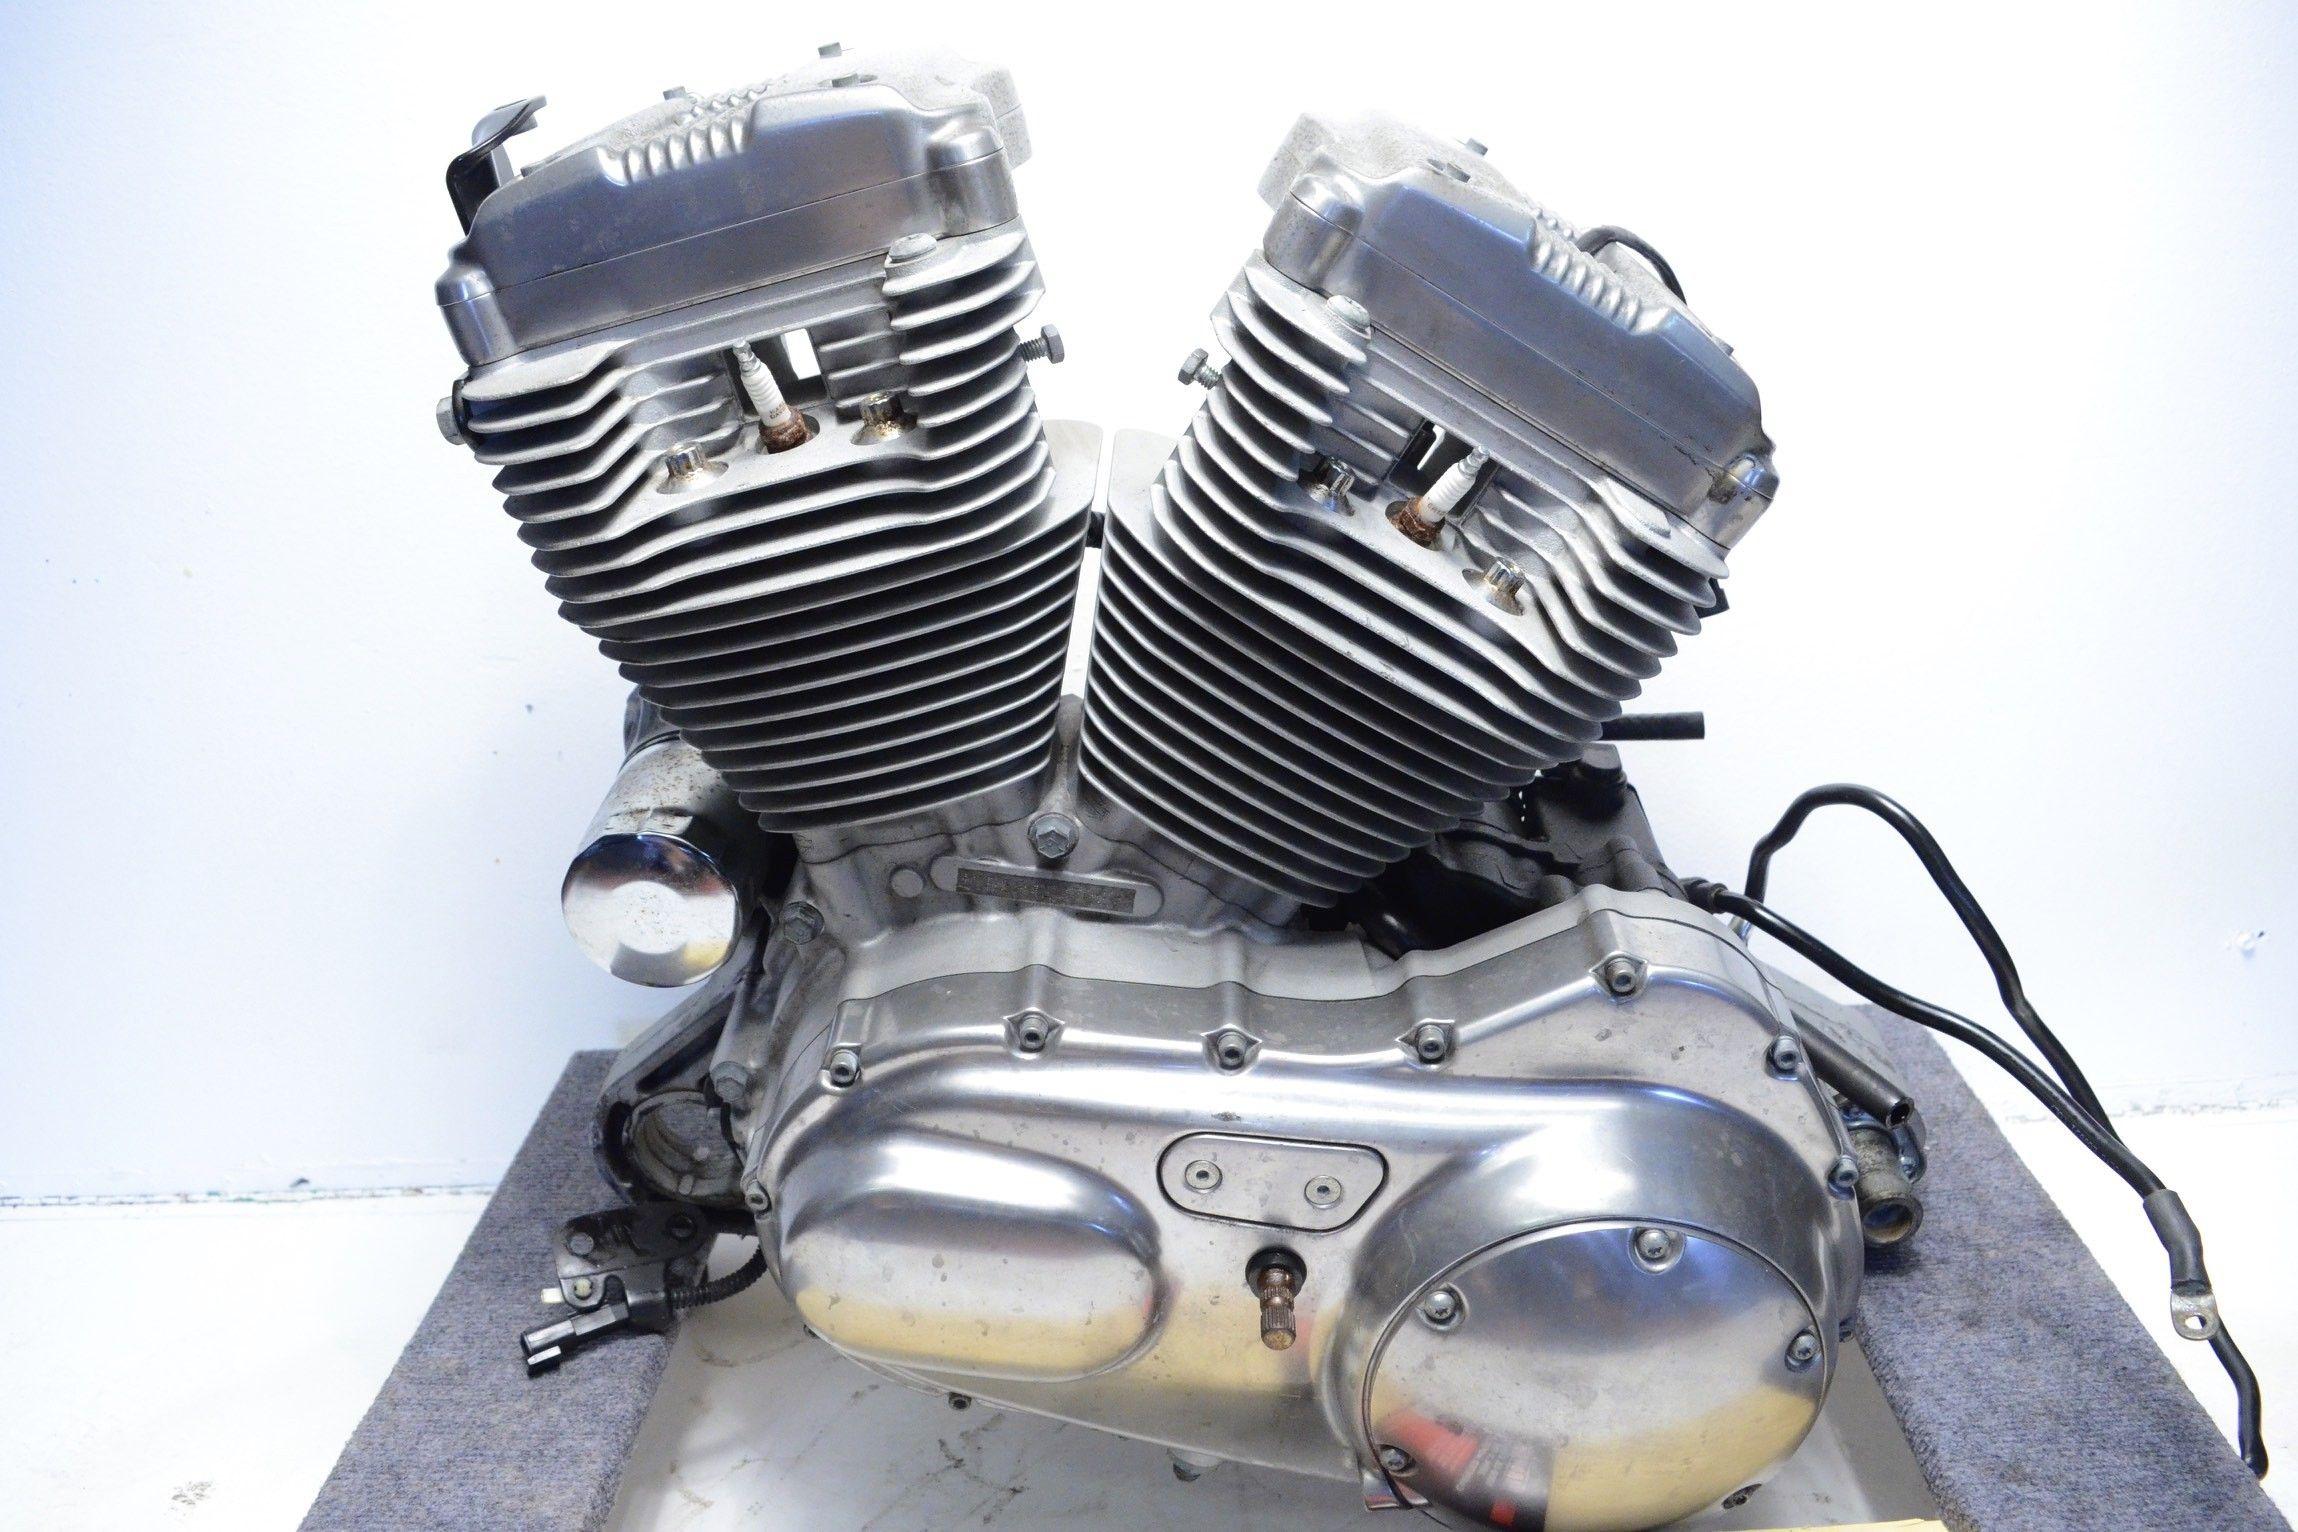 harley davidson engine - Google 検索